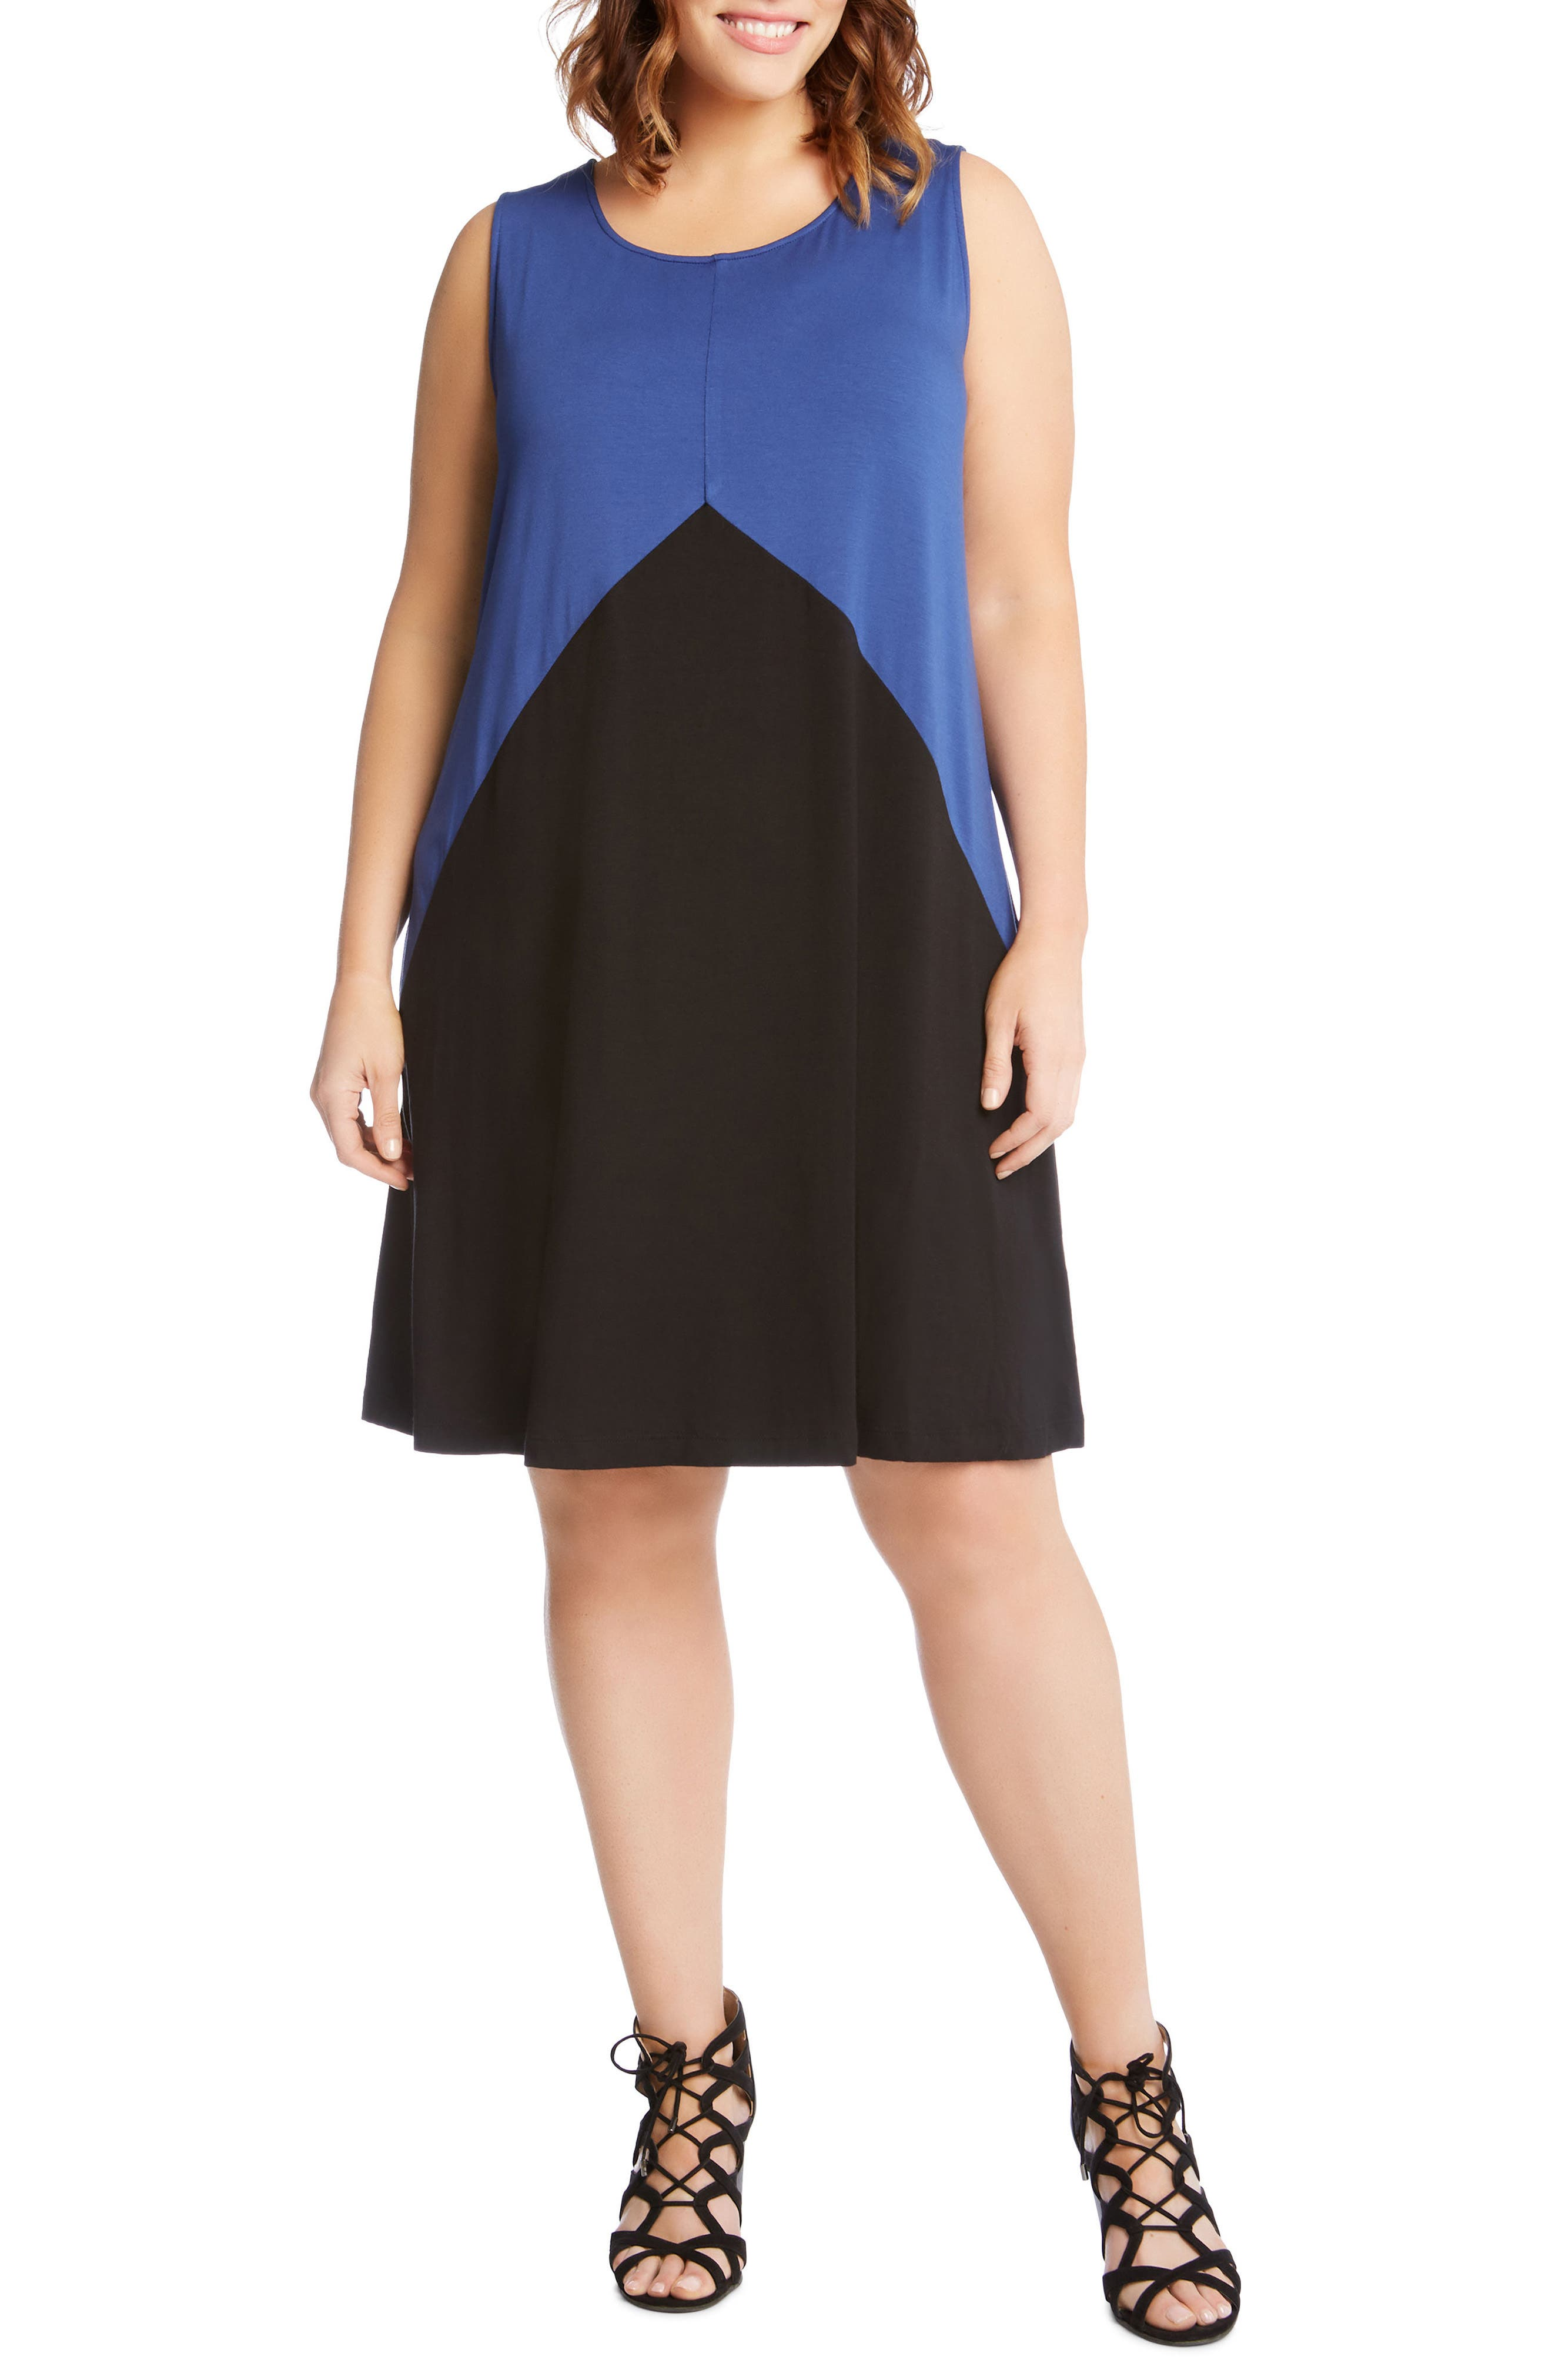 Colorblock Shift Dress,                             Main thumbnail 1, color,                             Blue With Black